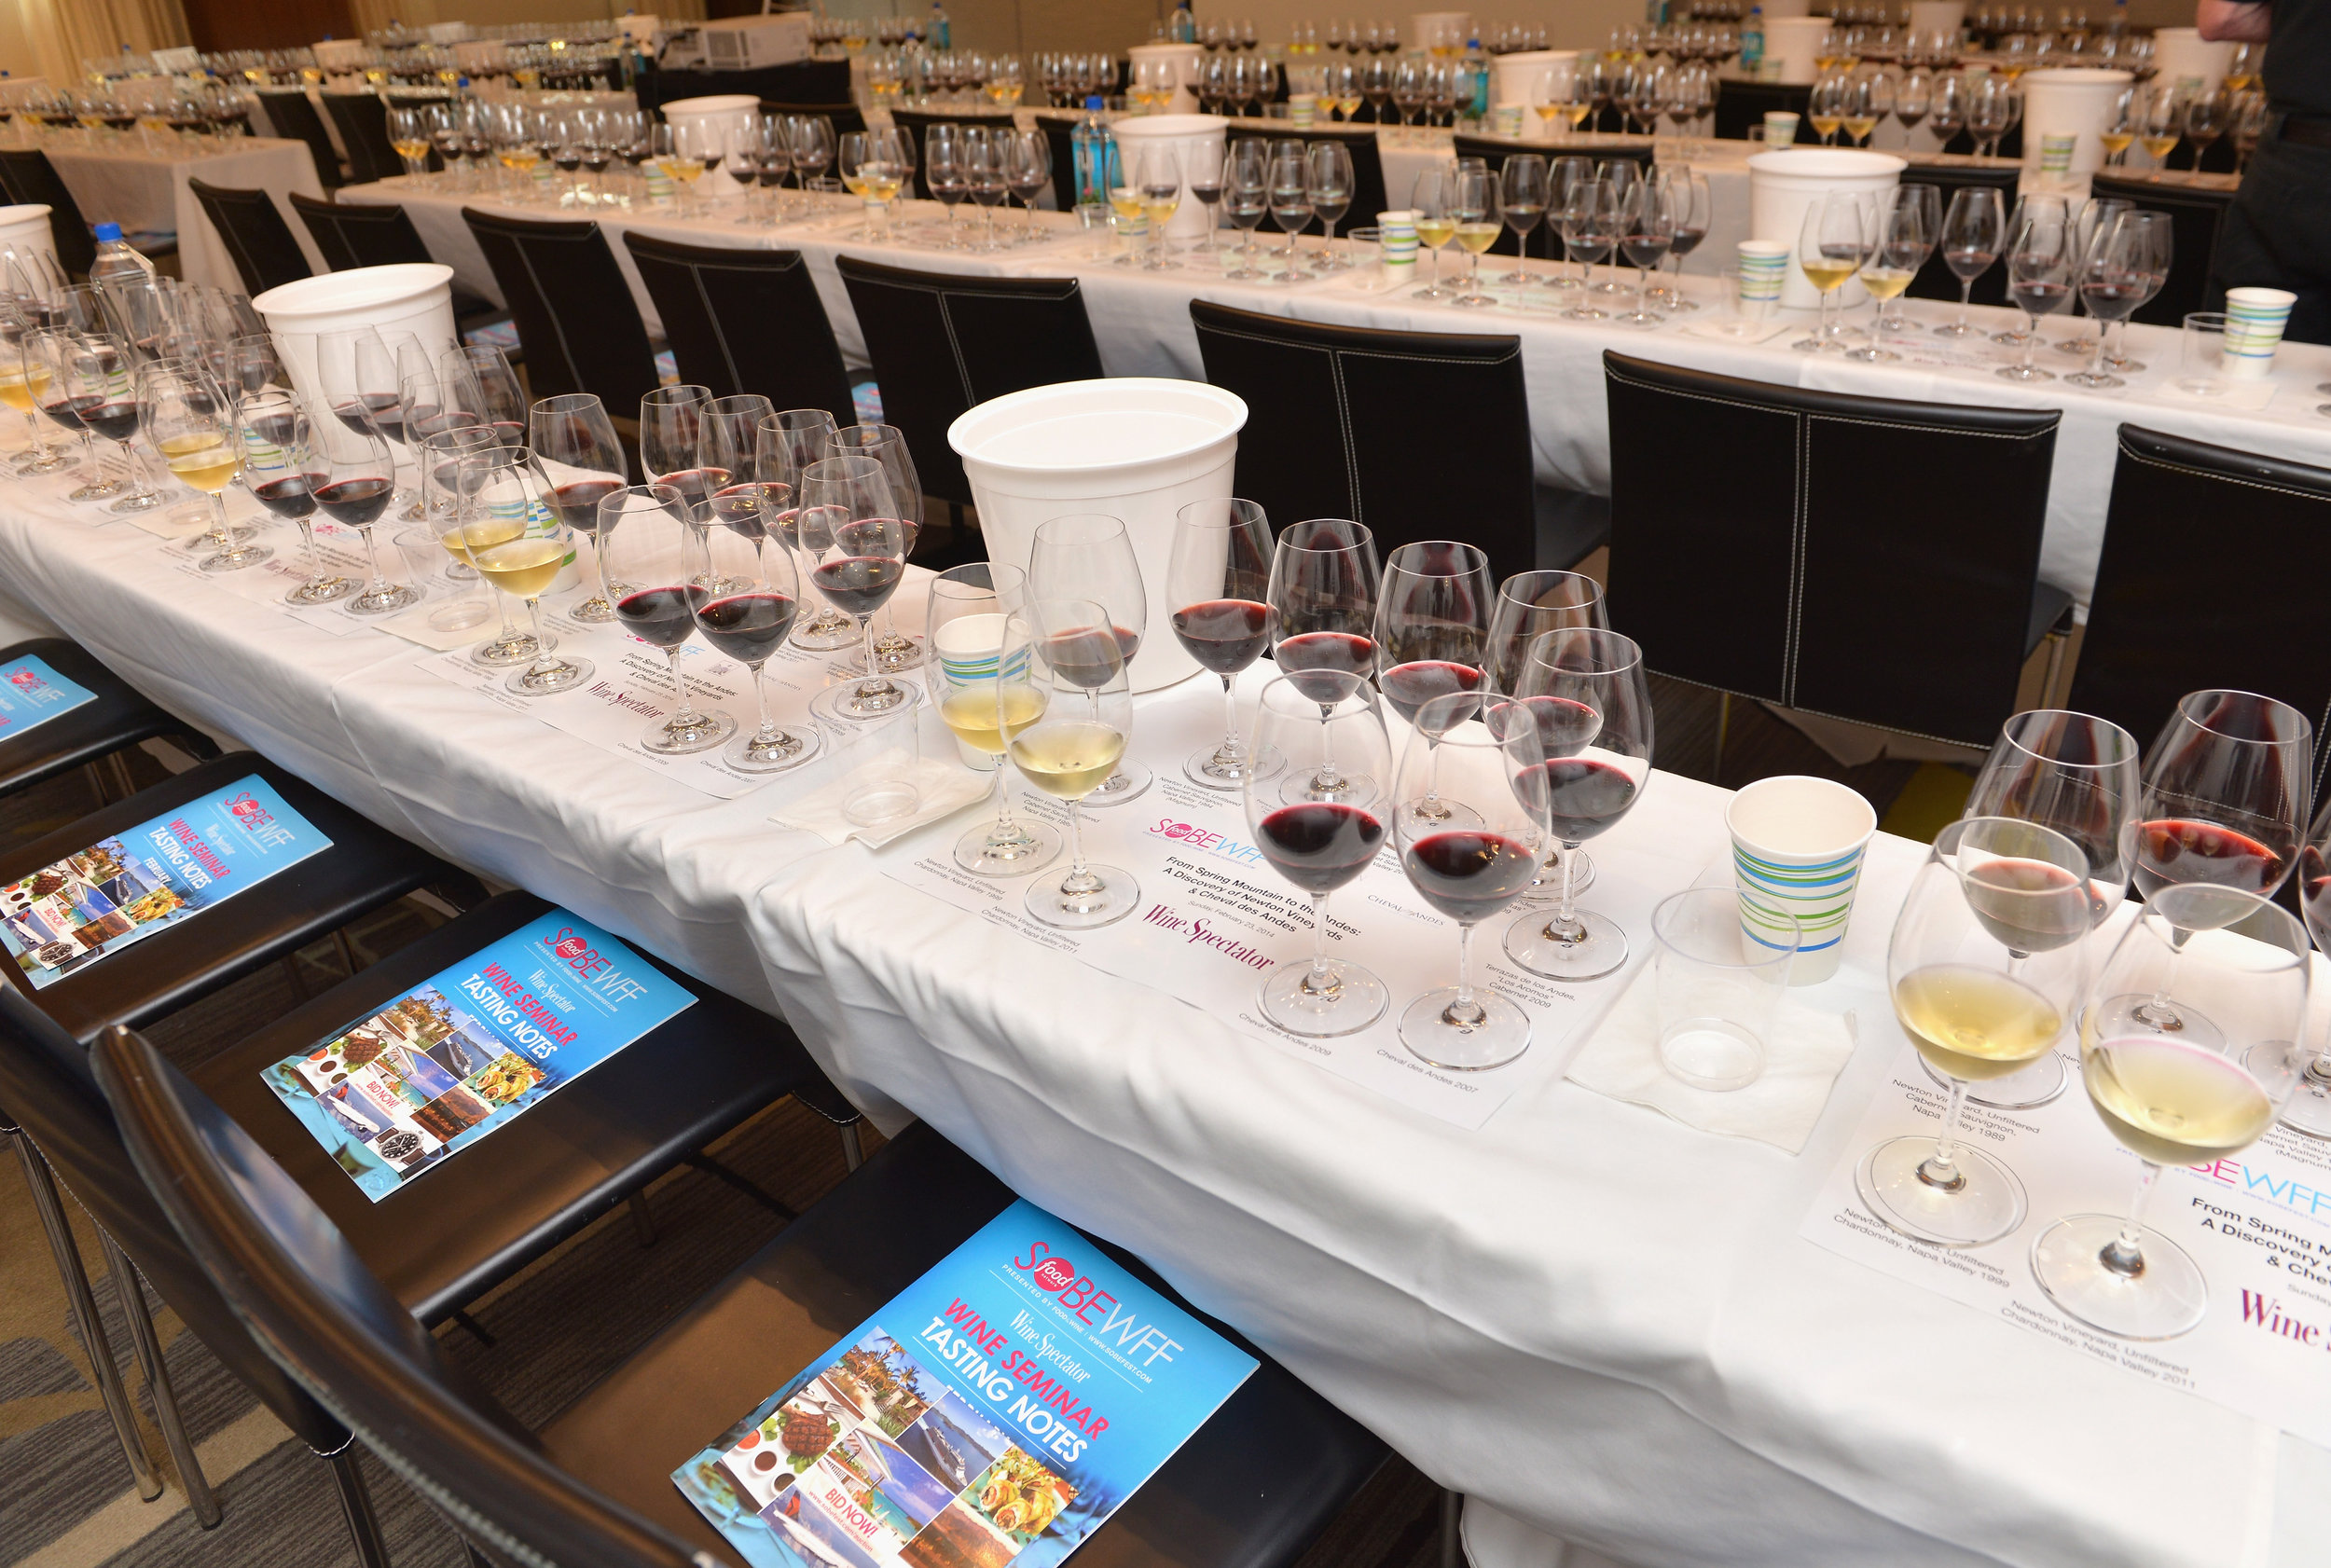 1-9-15-SOBEWFF_Wine-Spectator-Wine-Seminar_Getty-Images-3.jpg